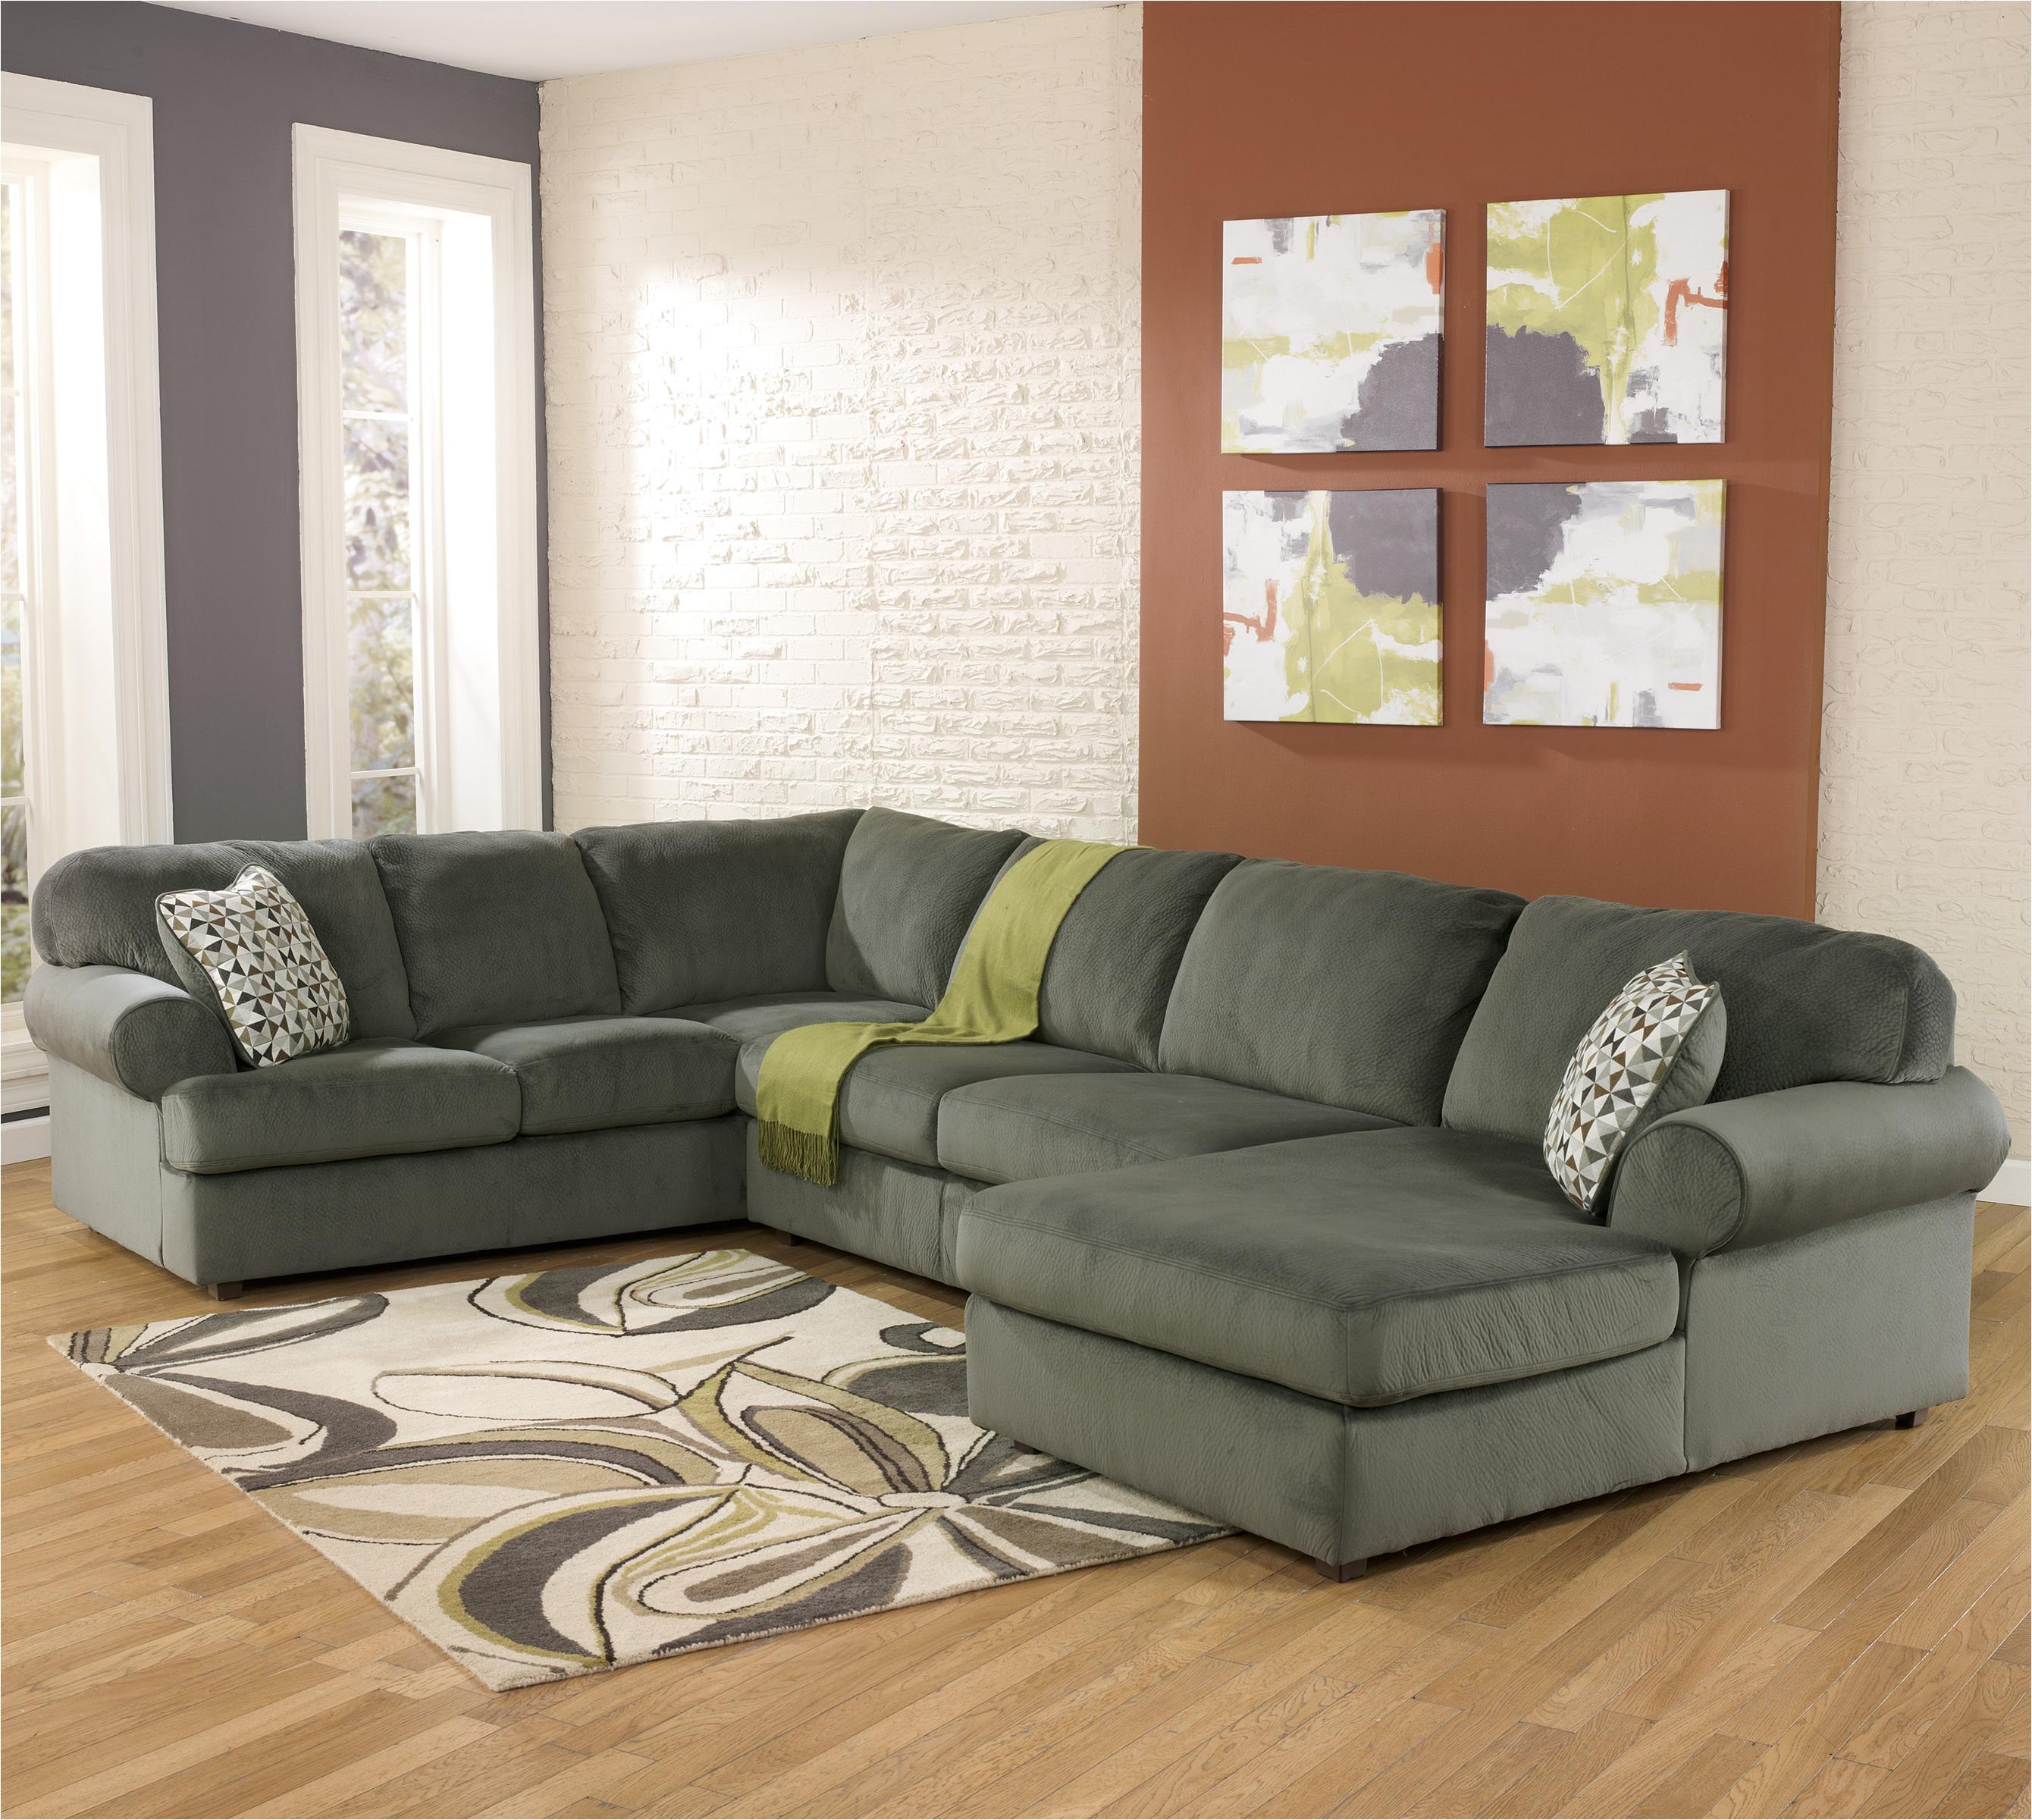 furniture stores in jonesboro ar hank s fine furniture furniture in rogers ar